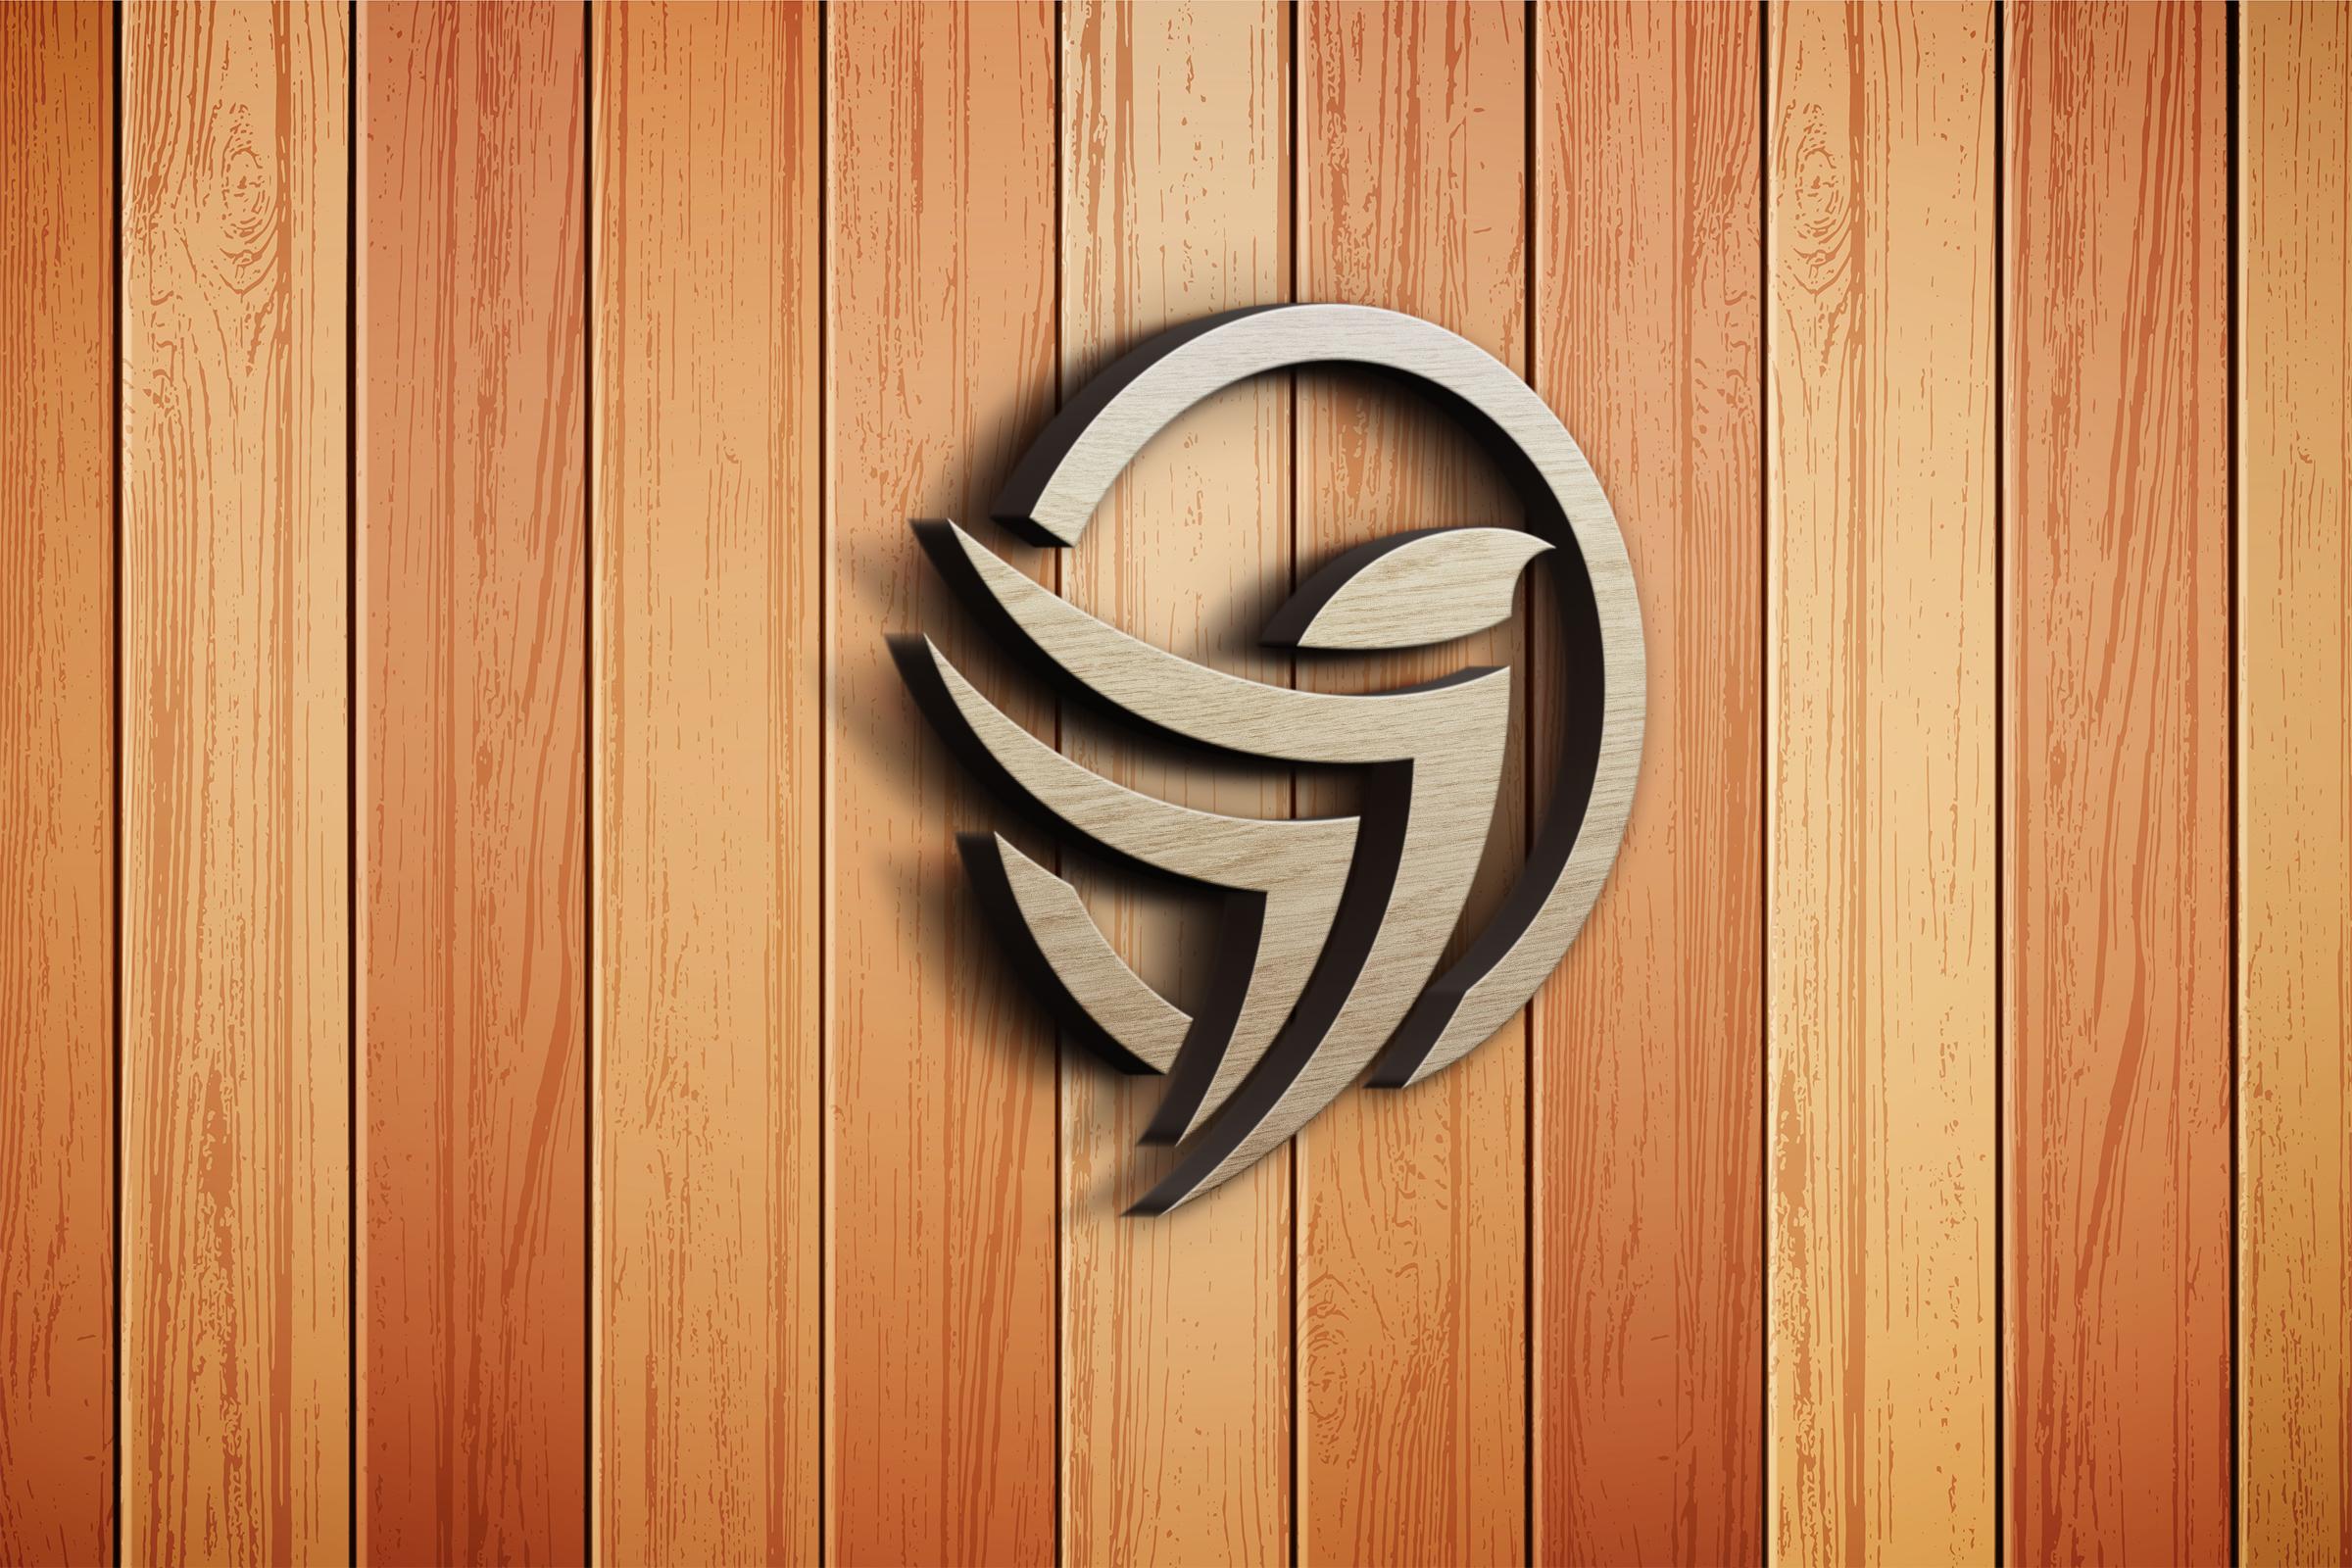 I will design an attractive logo